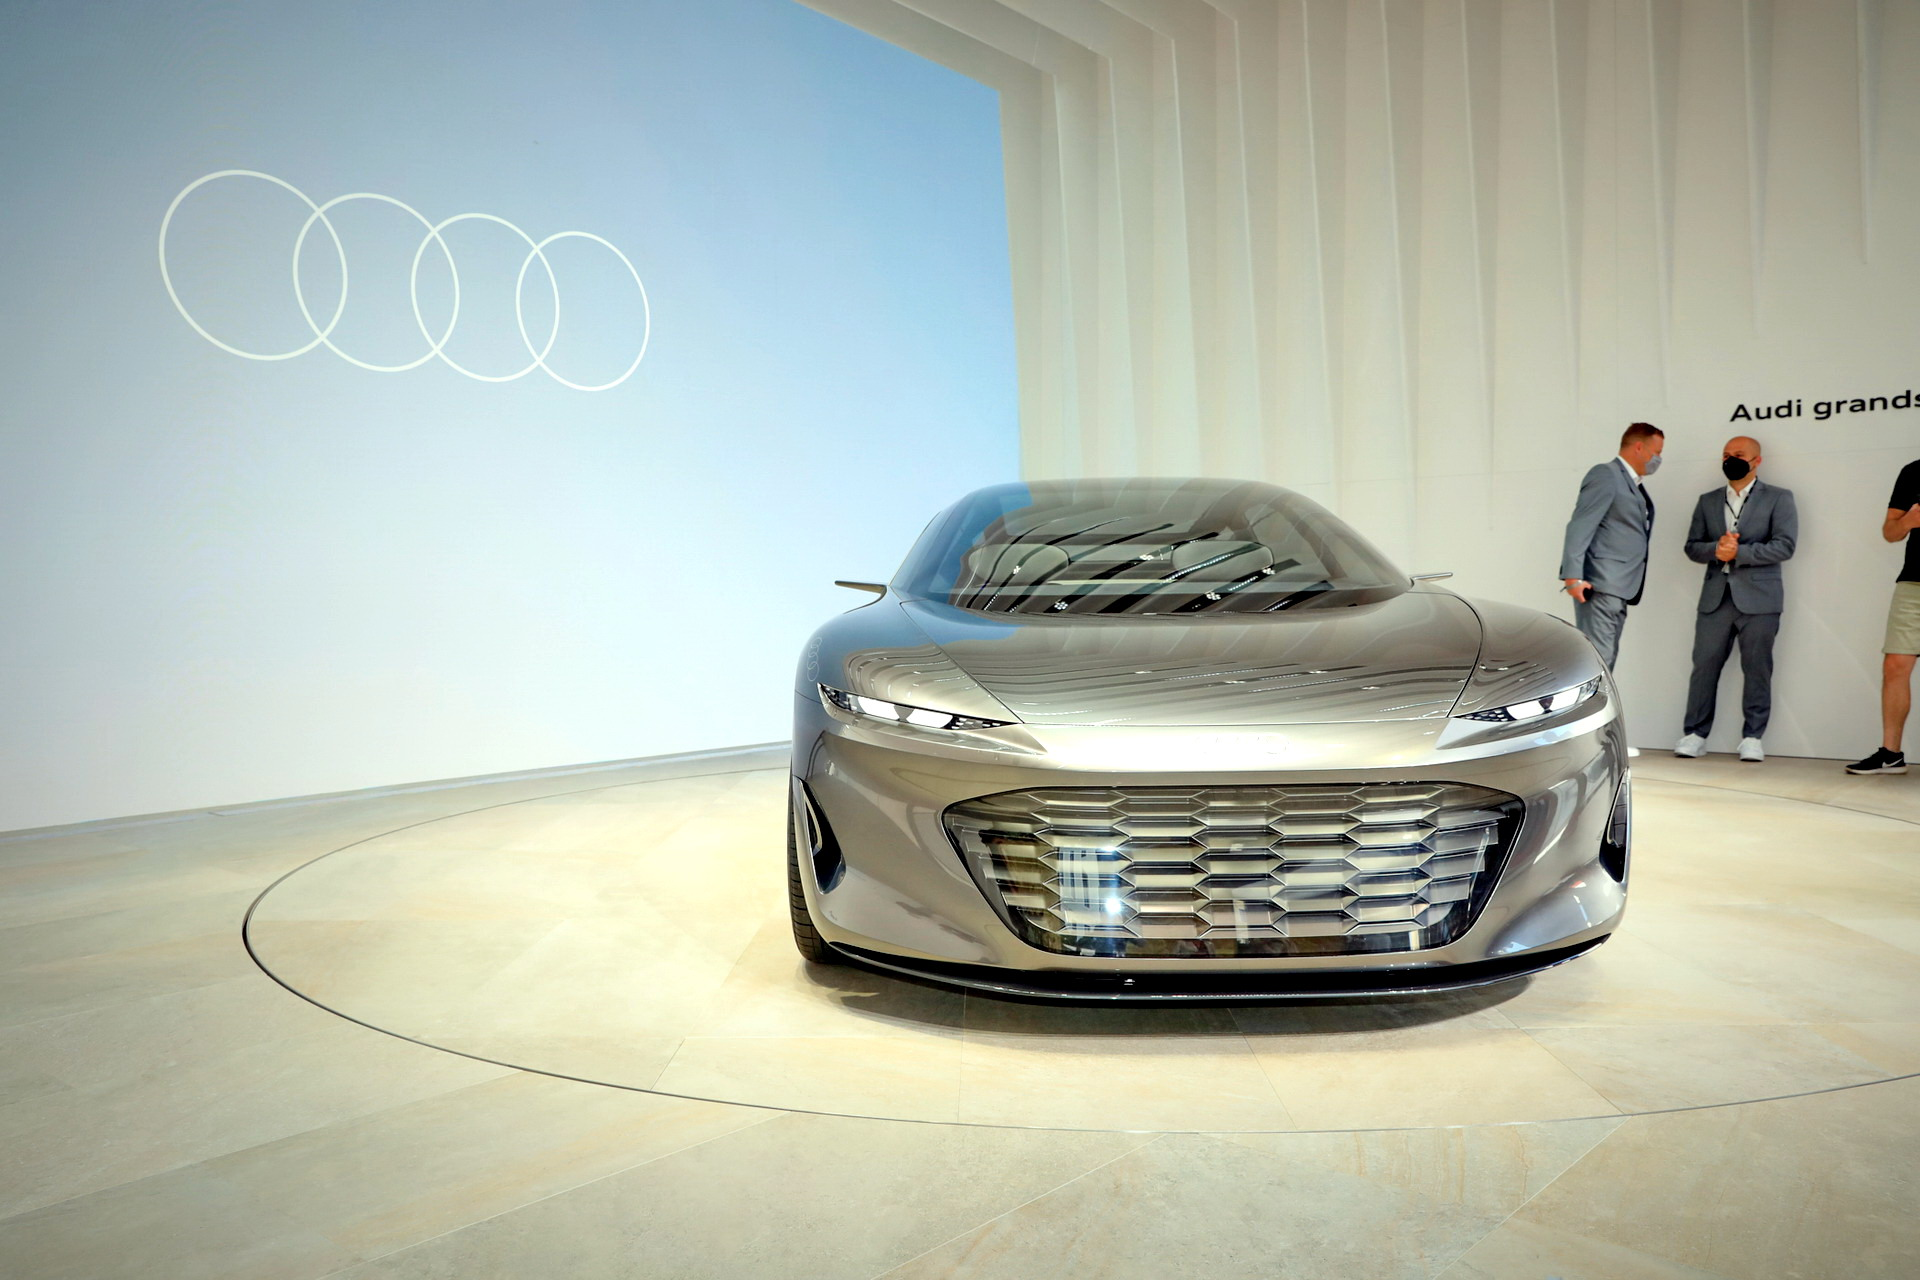 Audi-GrandSphere-Concept-A8-38.jpg